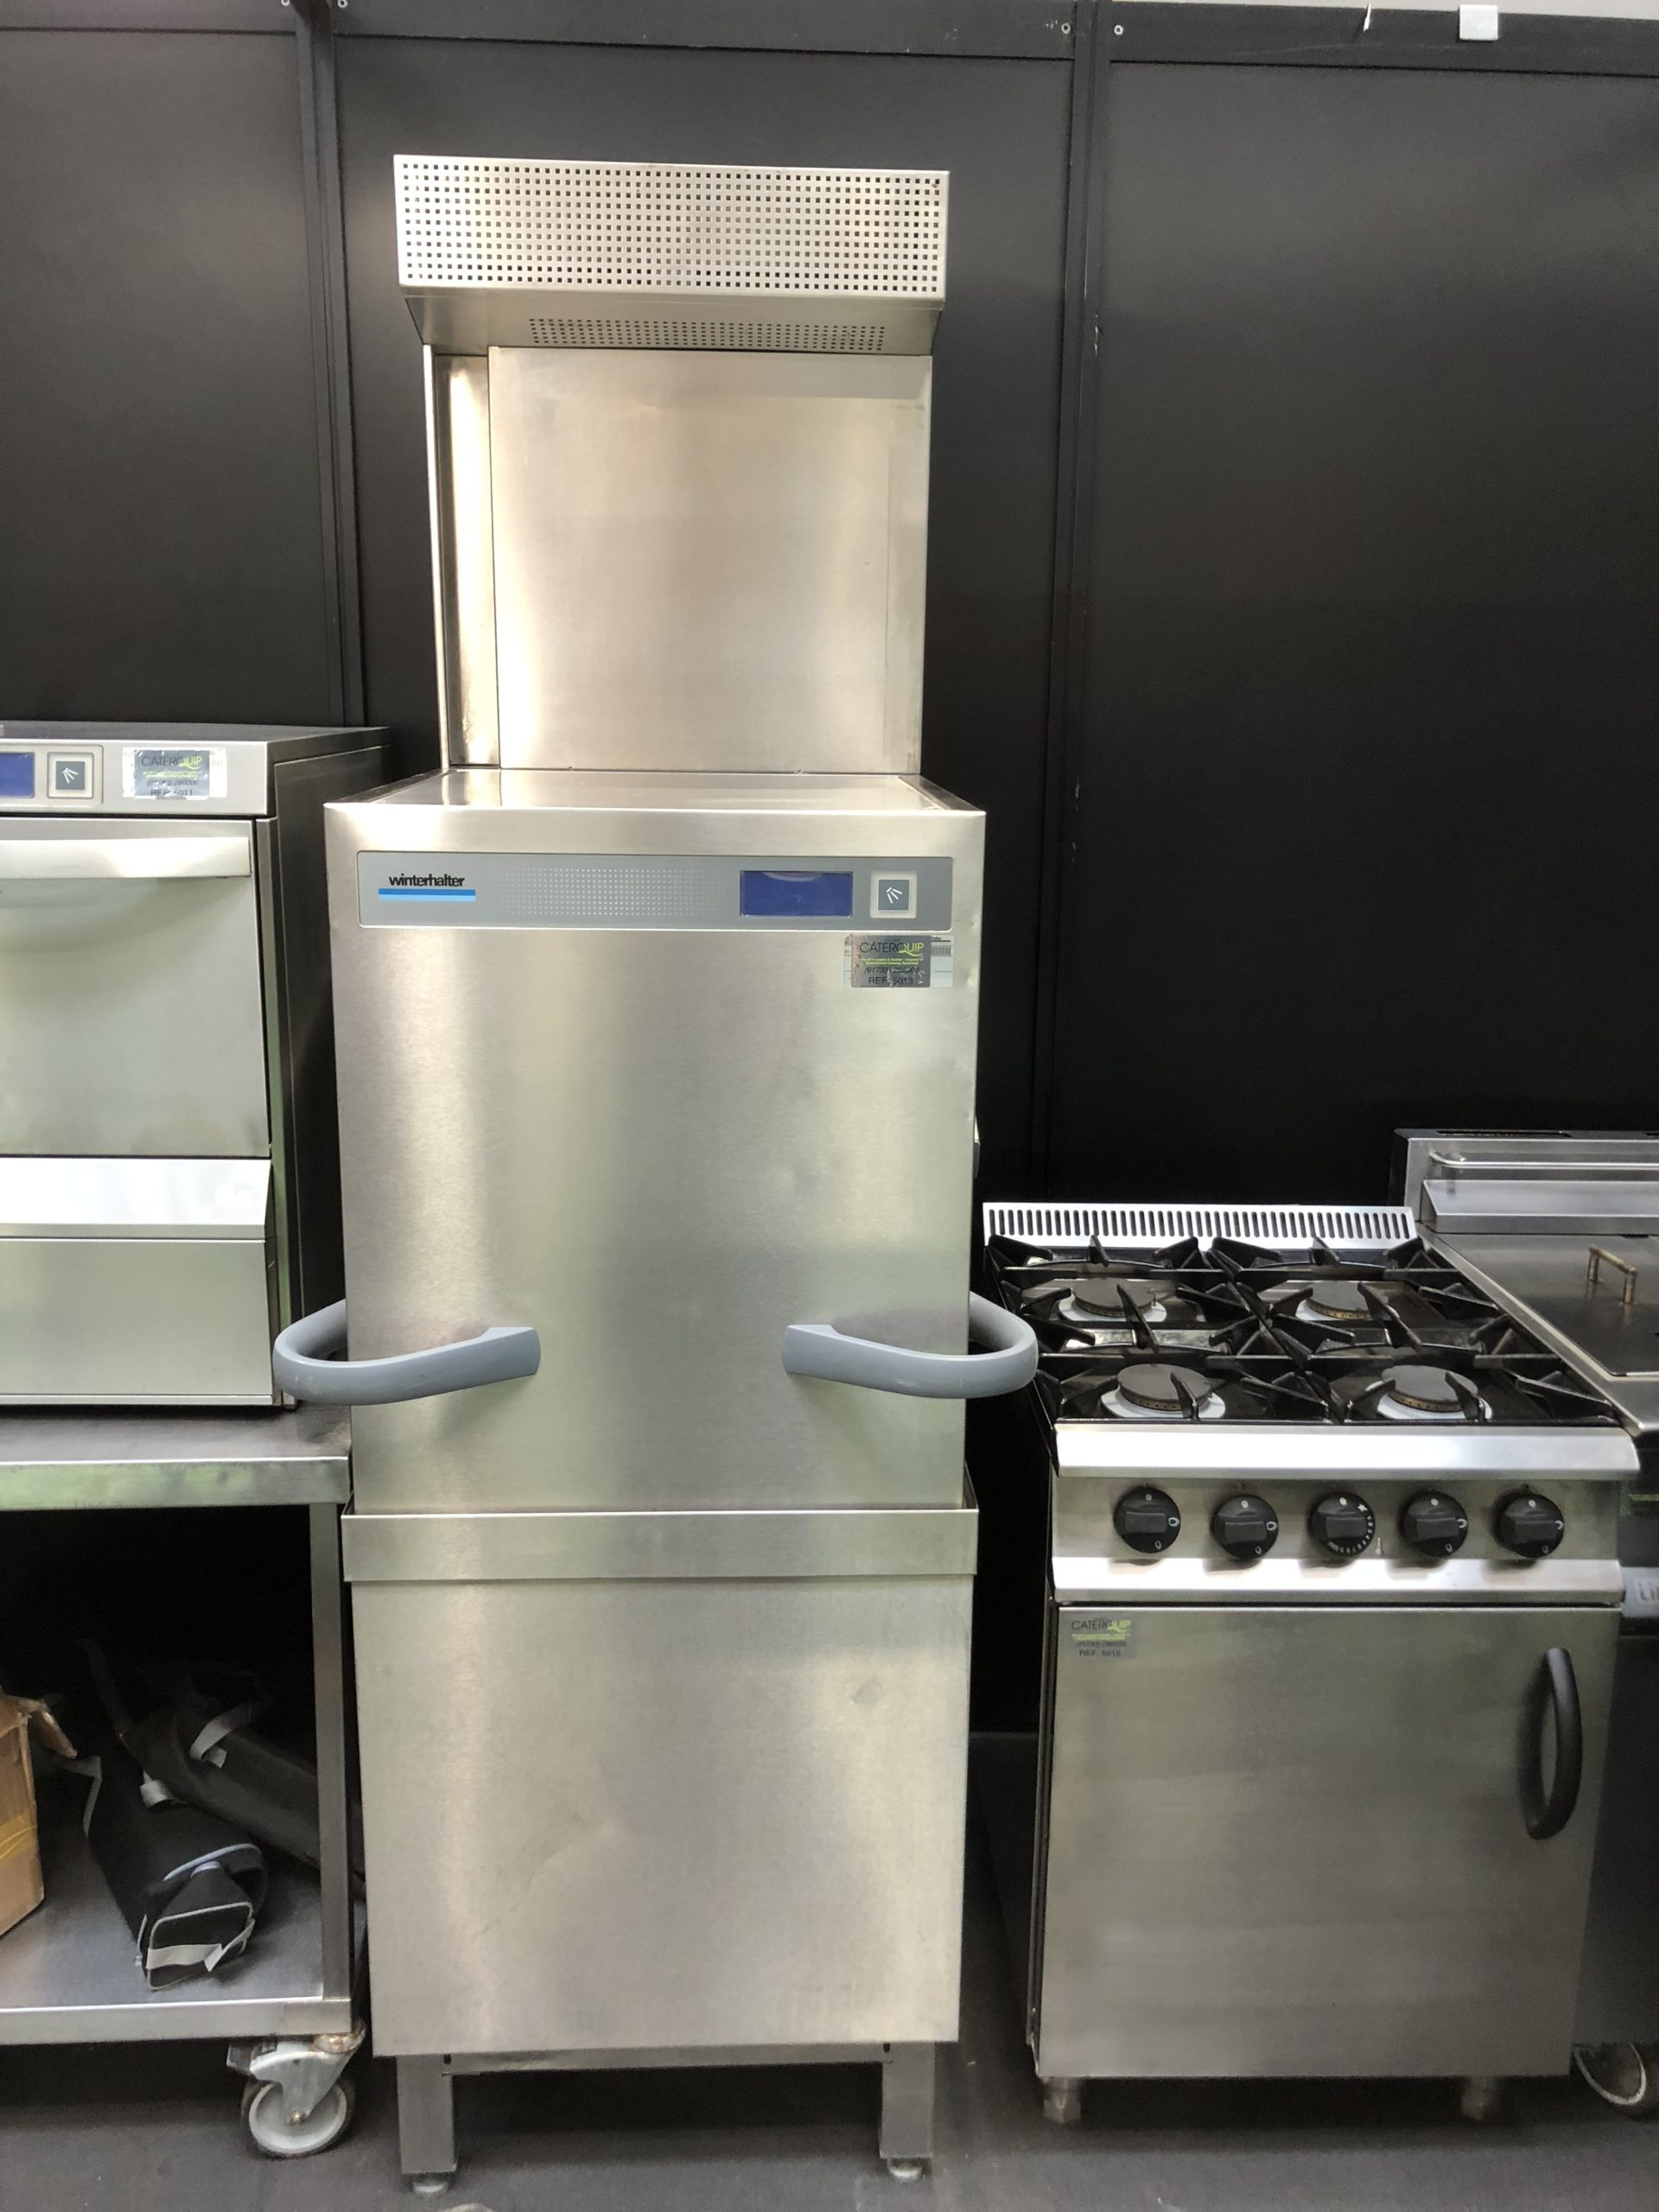 WINTERHALTER PT-M ENERGY Pass Through Dish Washer